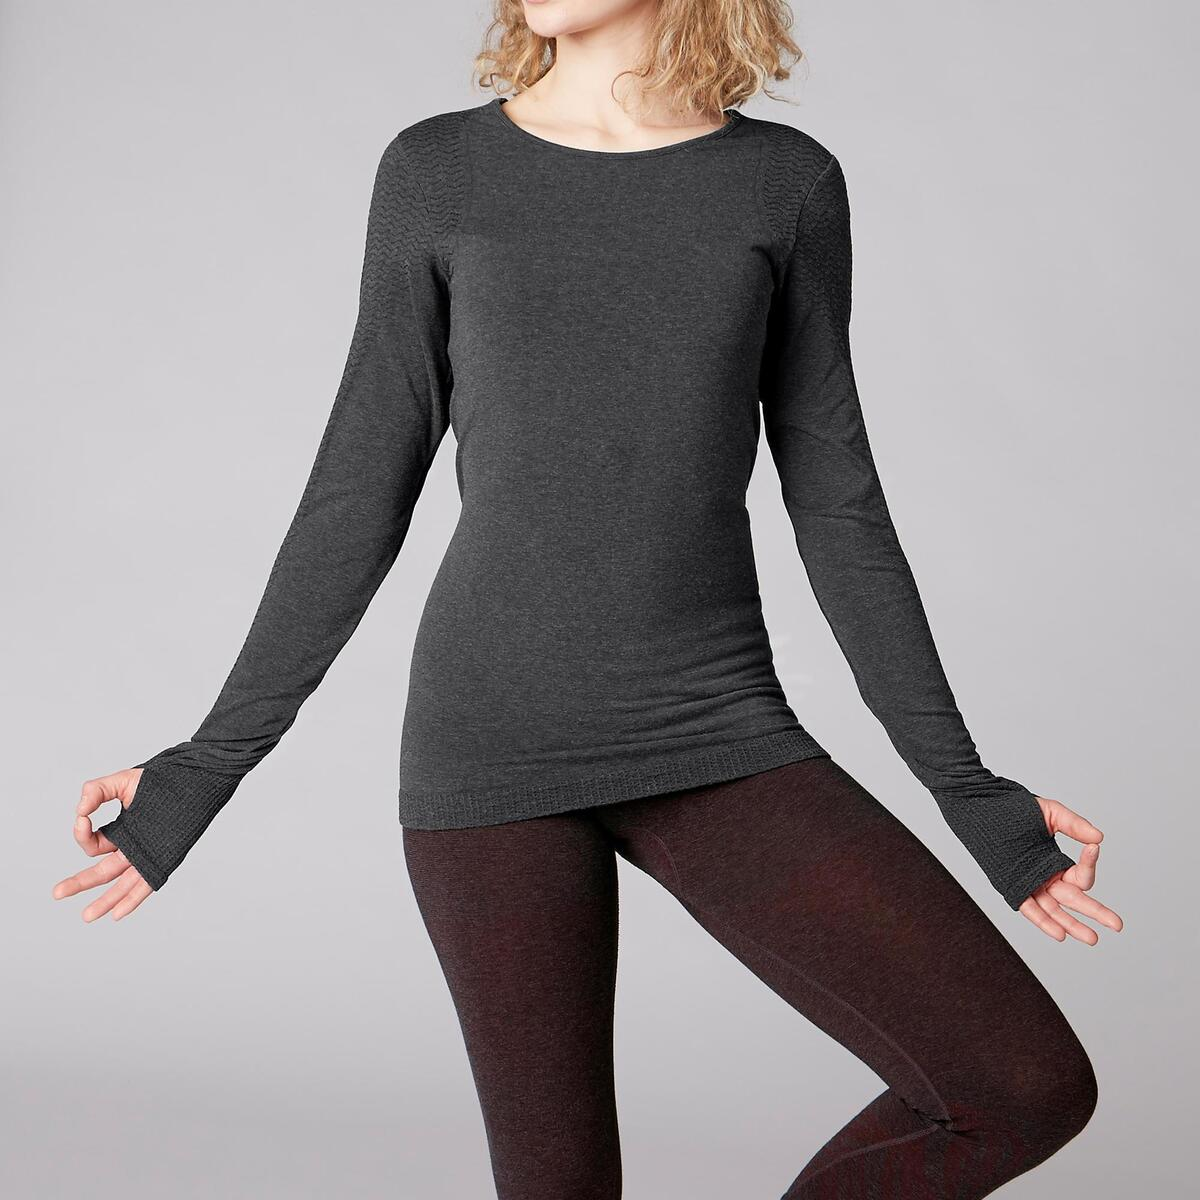 Bild 2 von Langarmshirt Yoga Damen dunkelgrau